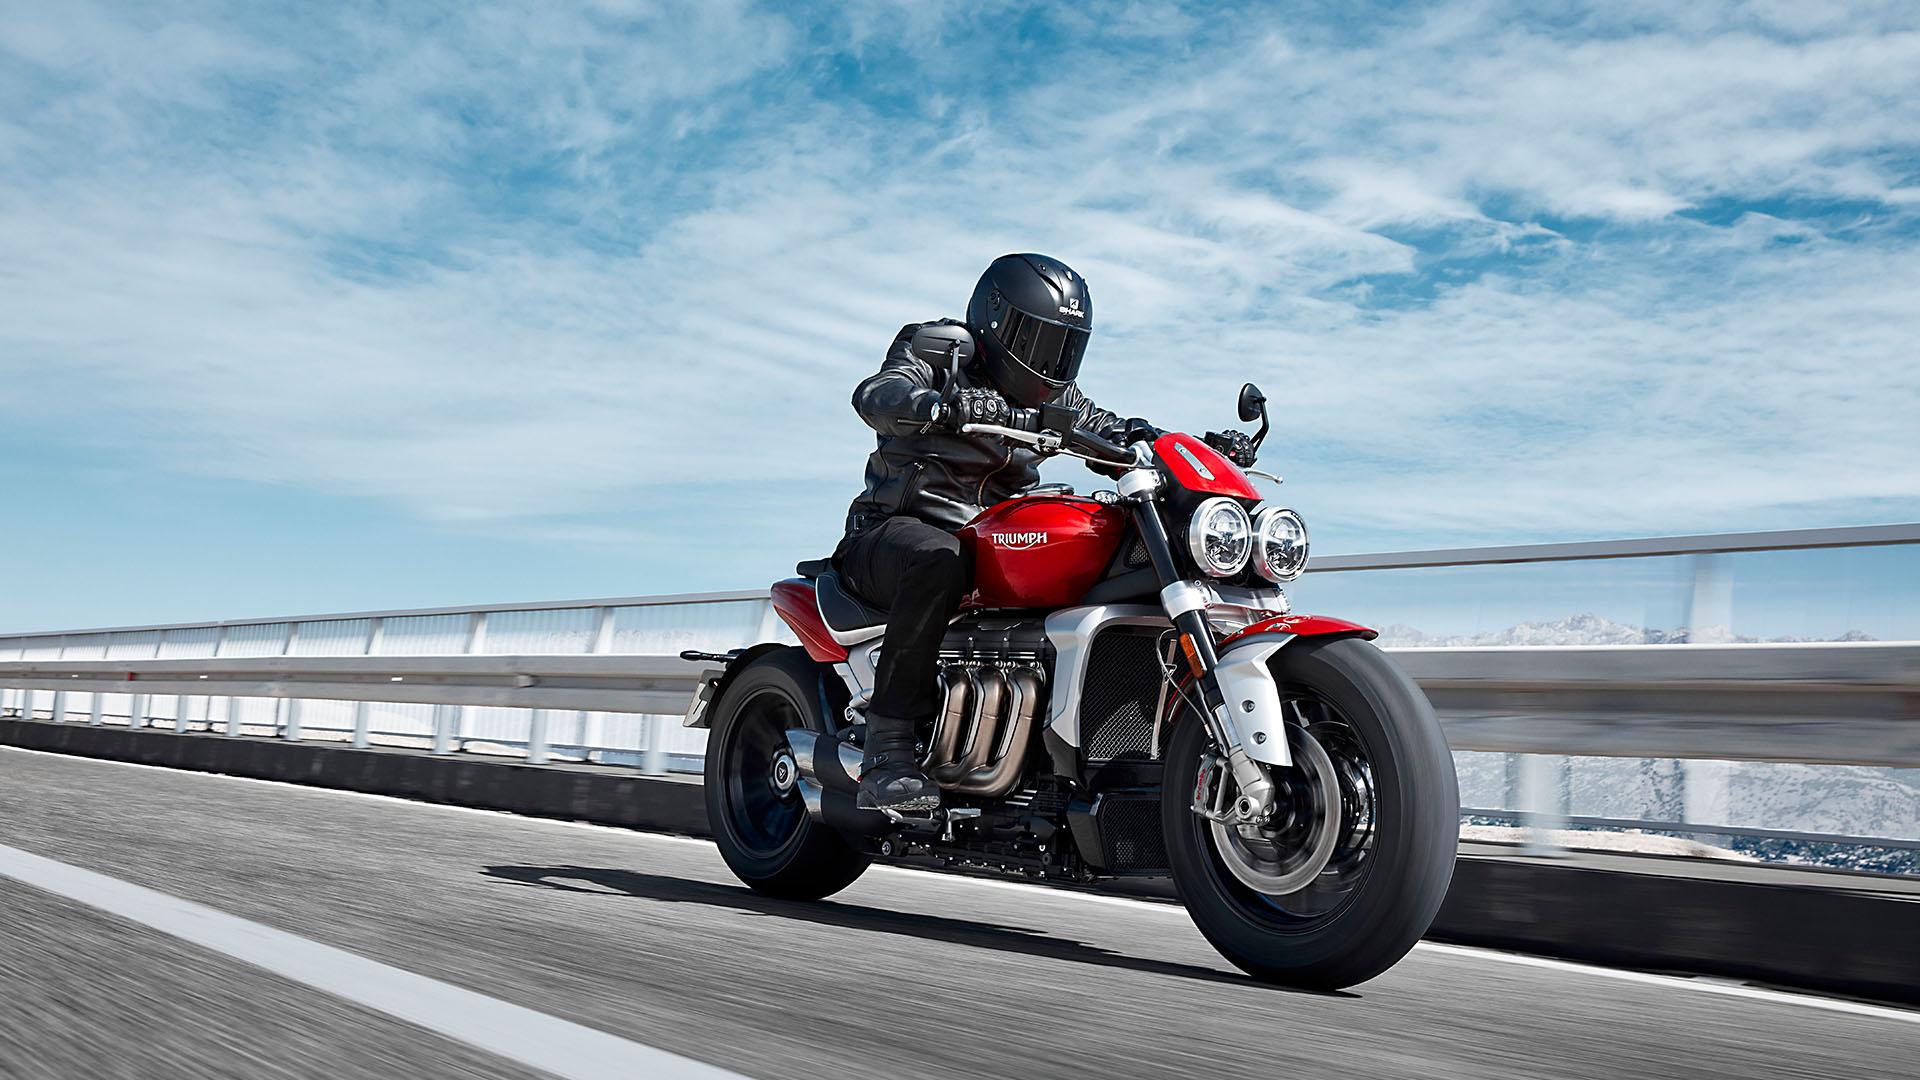 Triumph new Rocket 3 R in Korosi Red riding swiftly on a road that runs through a mountainous terrain